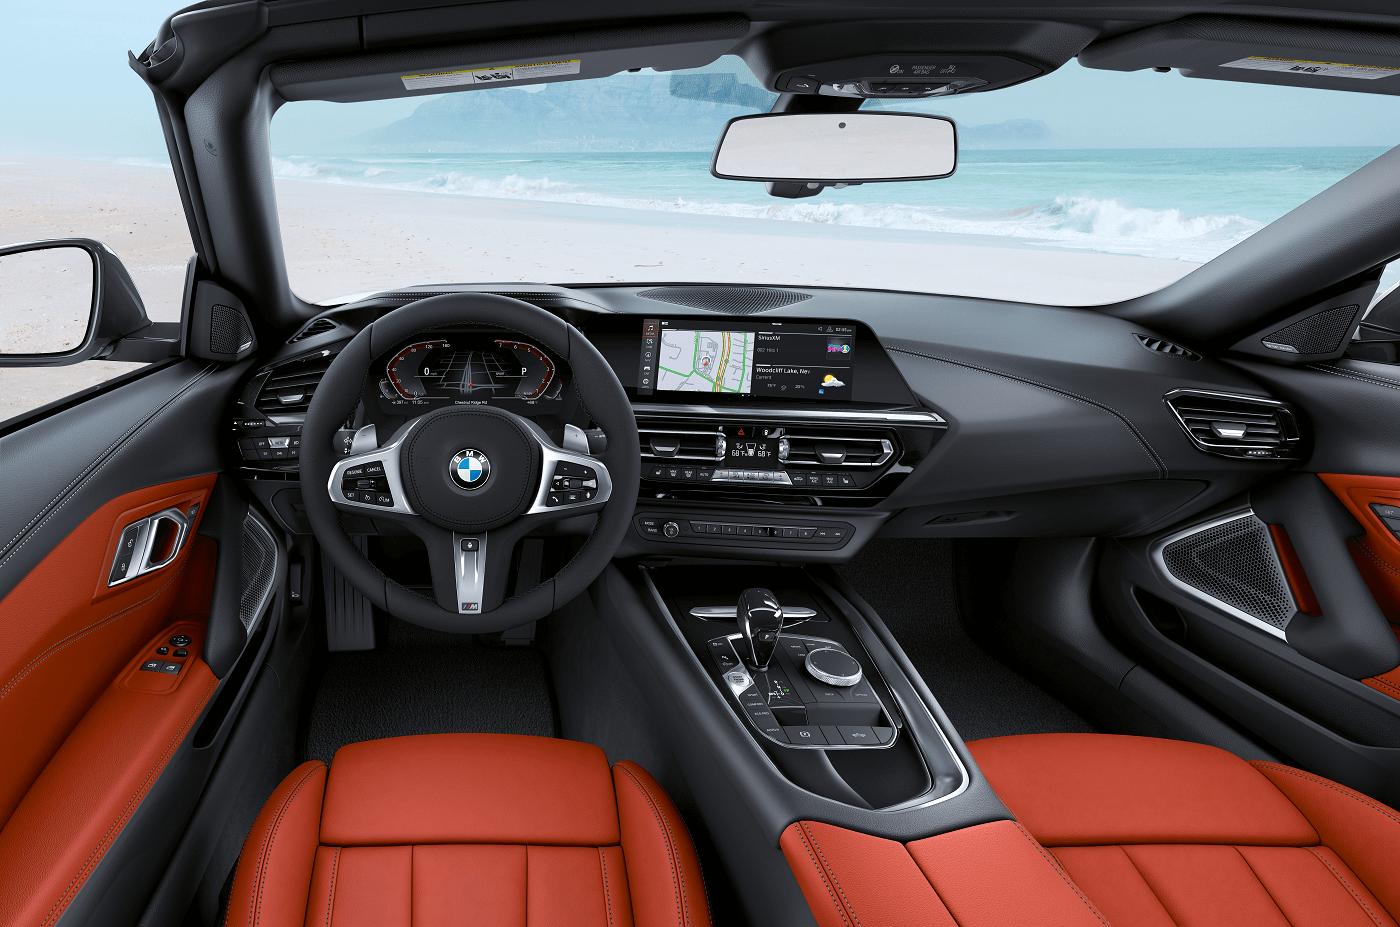 BMW Z4 Interior Technology